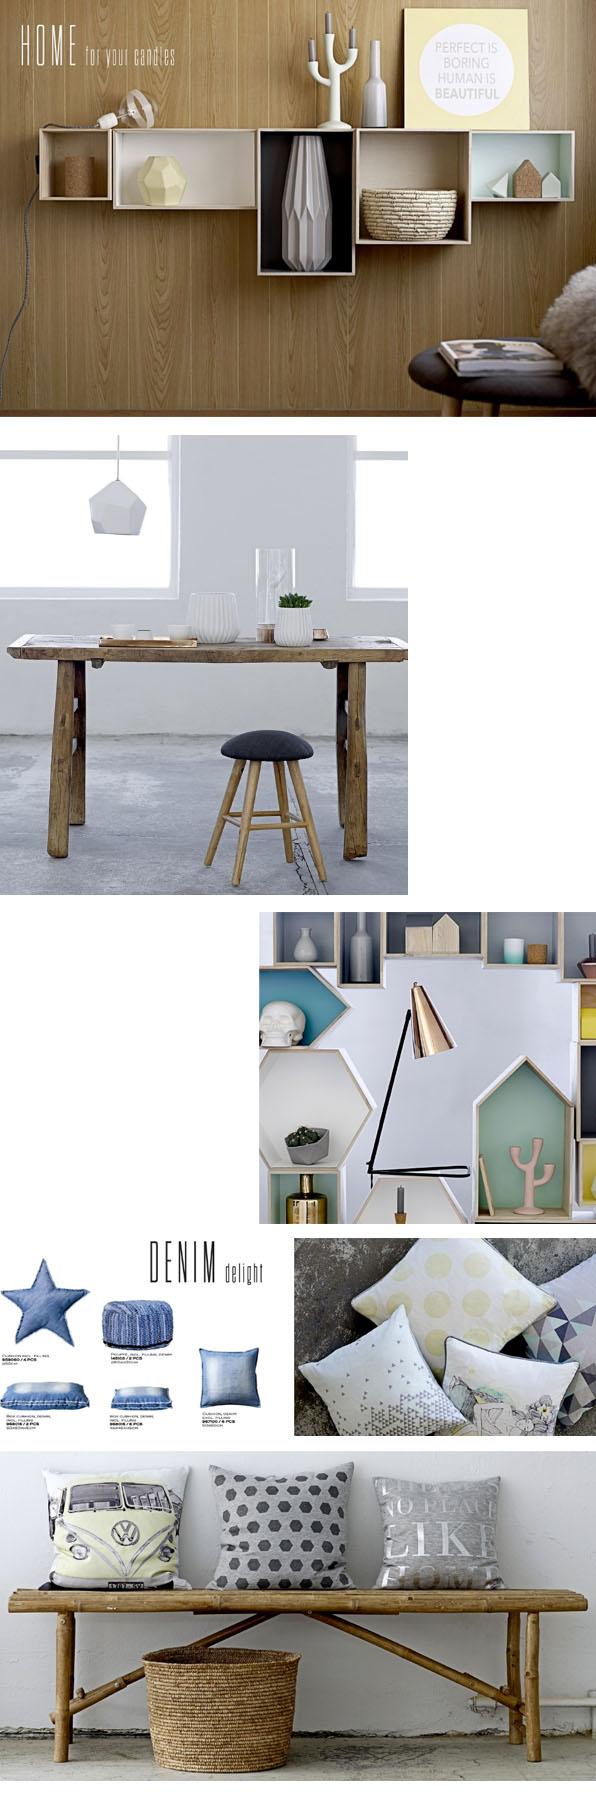 01 diseño nordico nordicdesign de © bloomingville en modus-vivendi